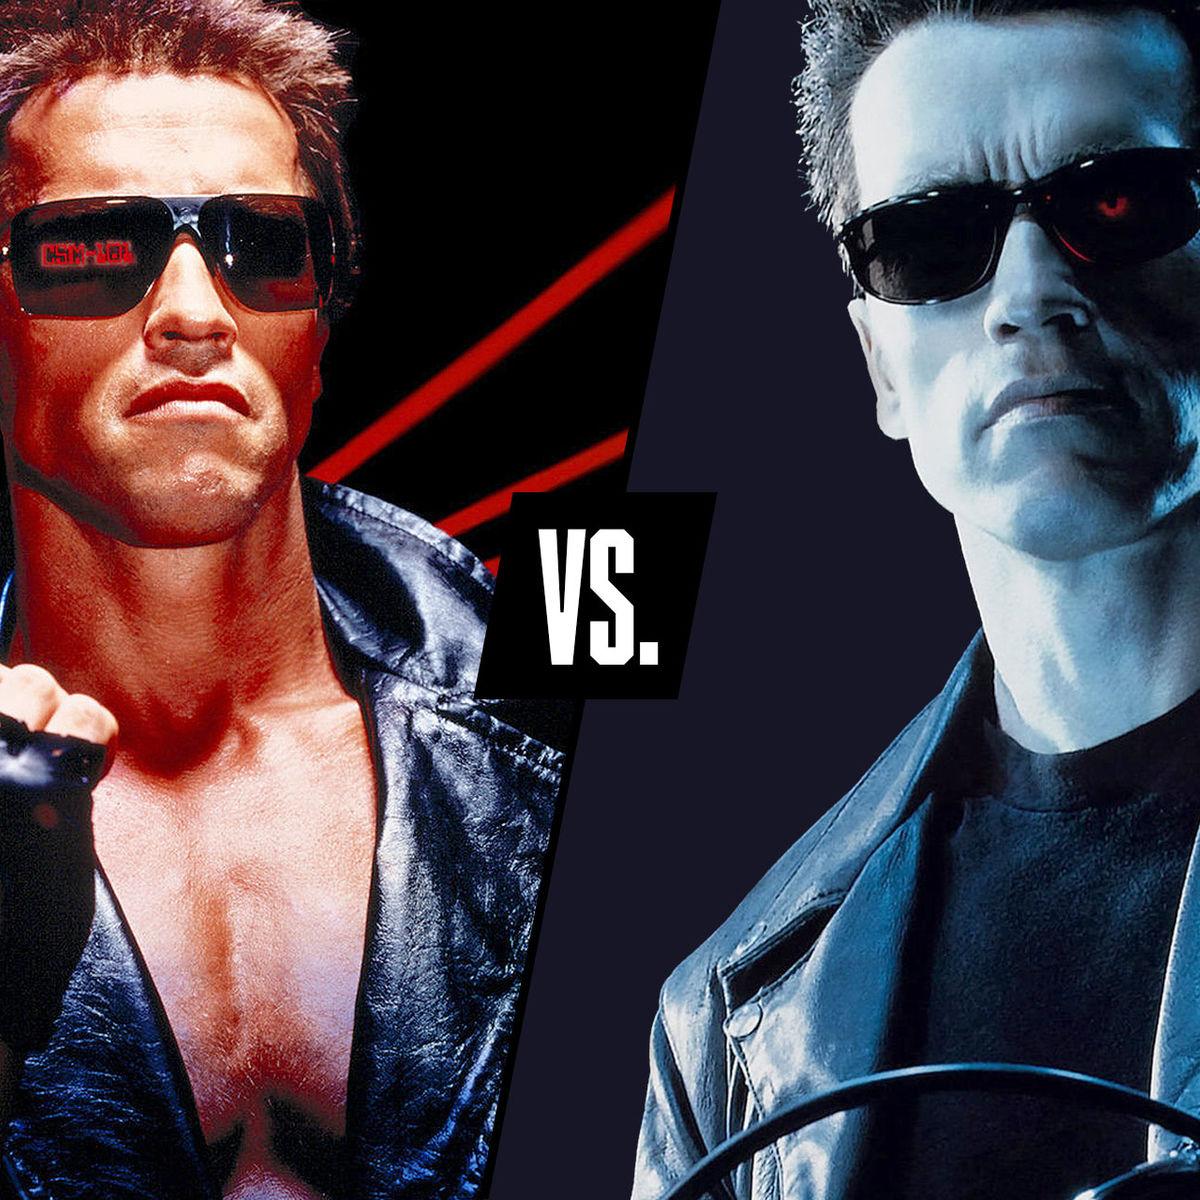 Terminator vs Terminator 2